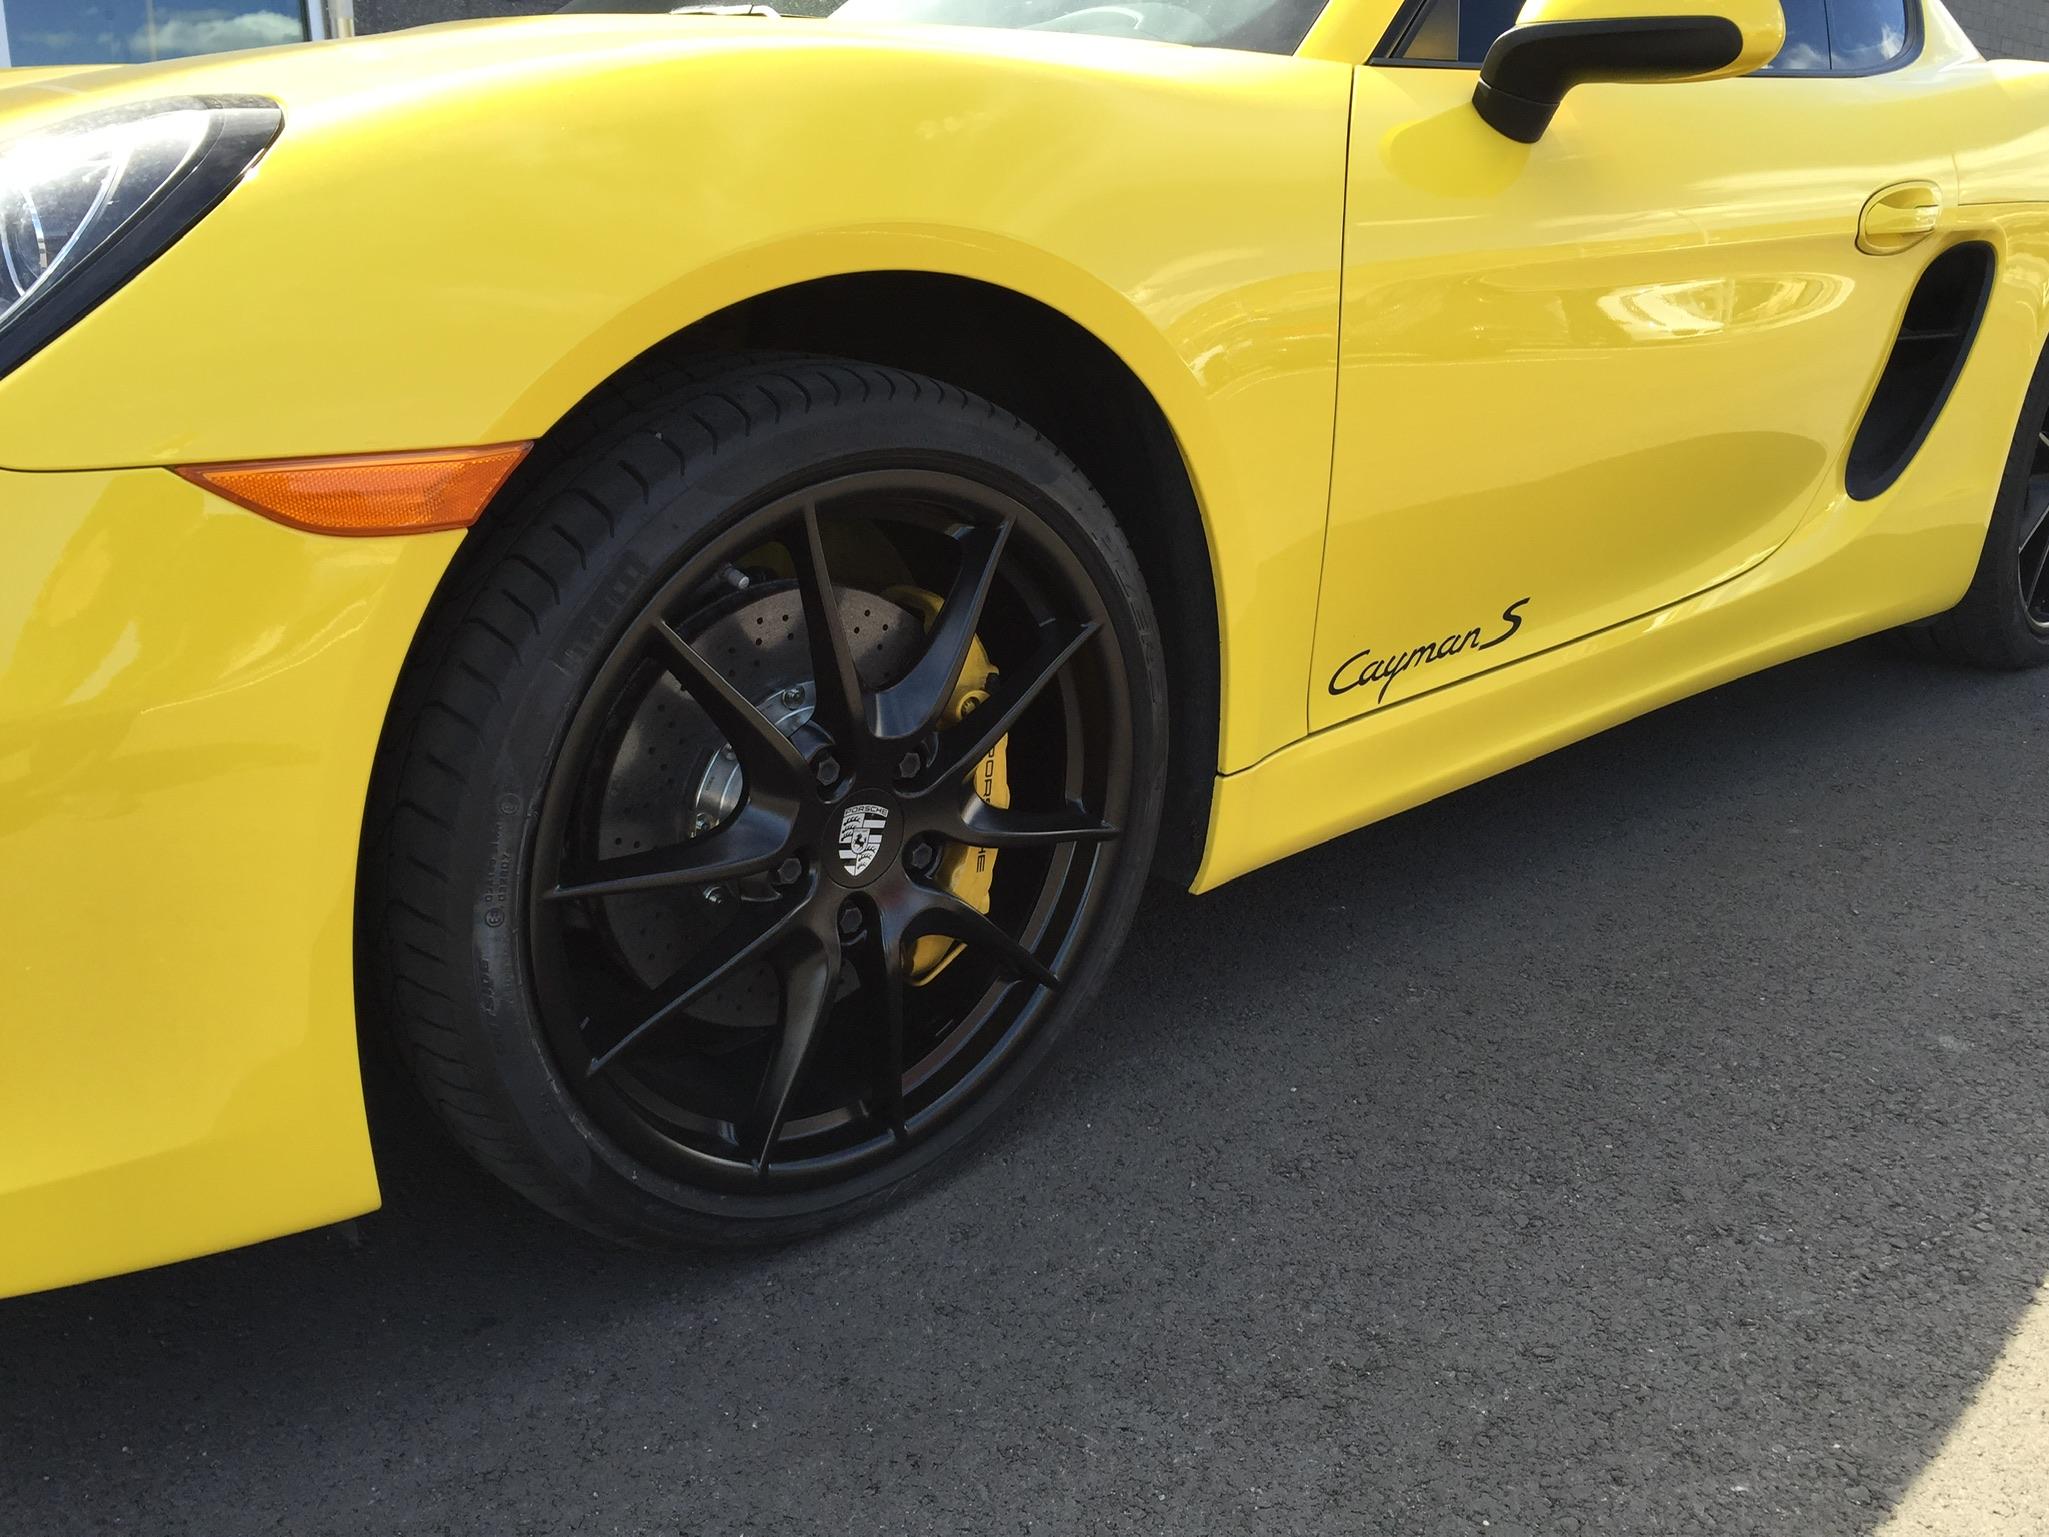 Porsche Cayman S After Wheel Painting